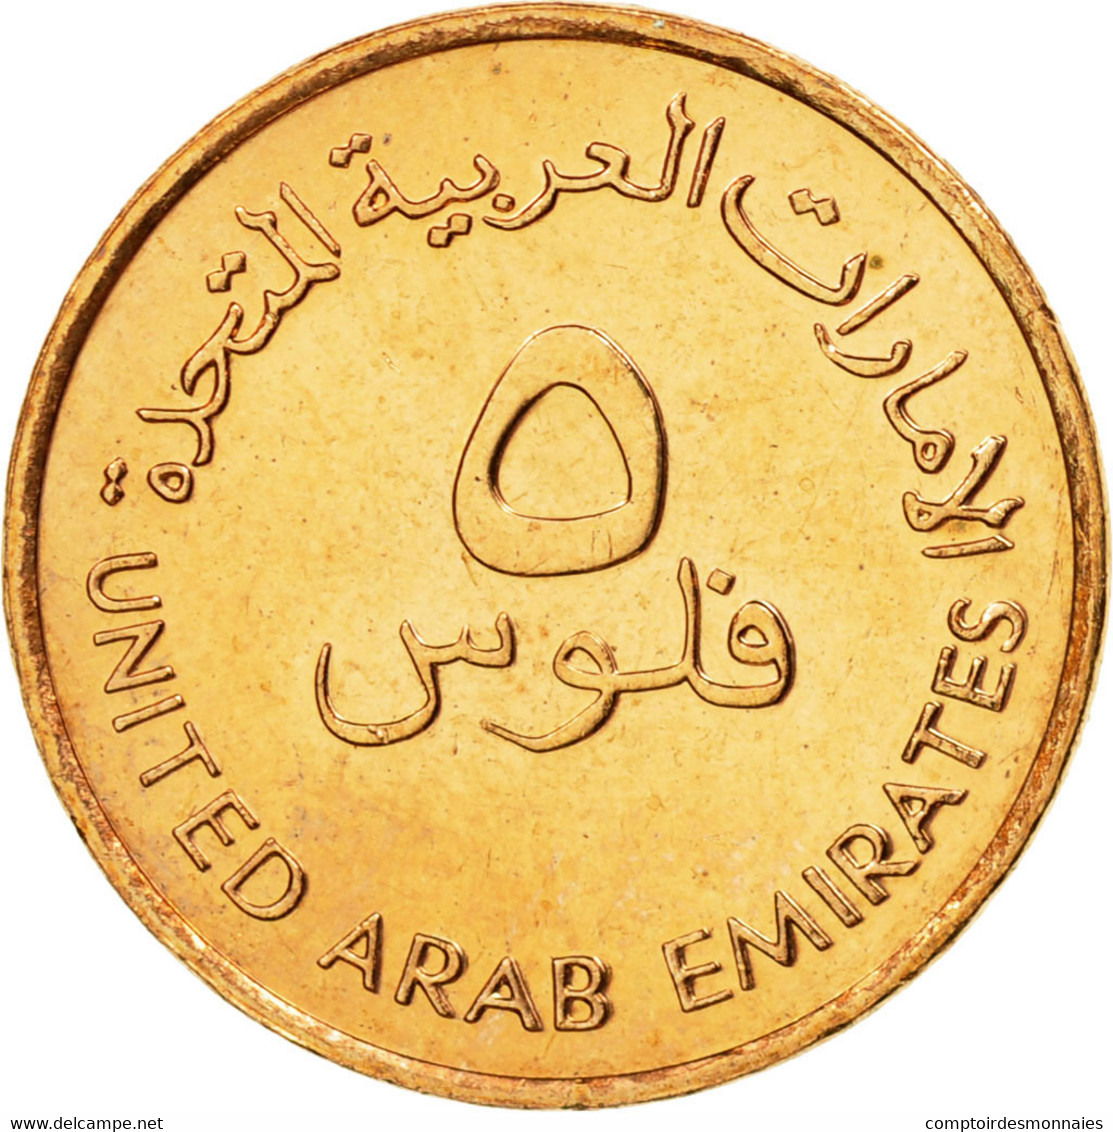 Monnaie, United Arab Emirates, 5 Fils, 2001, British Royal Mint, SUP, Bronze - Emirats Arabes Unis